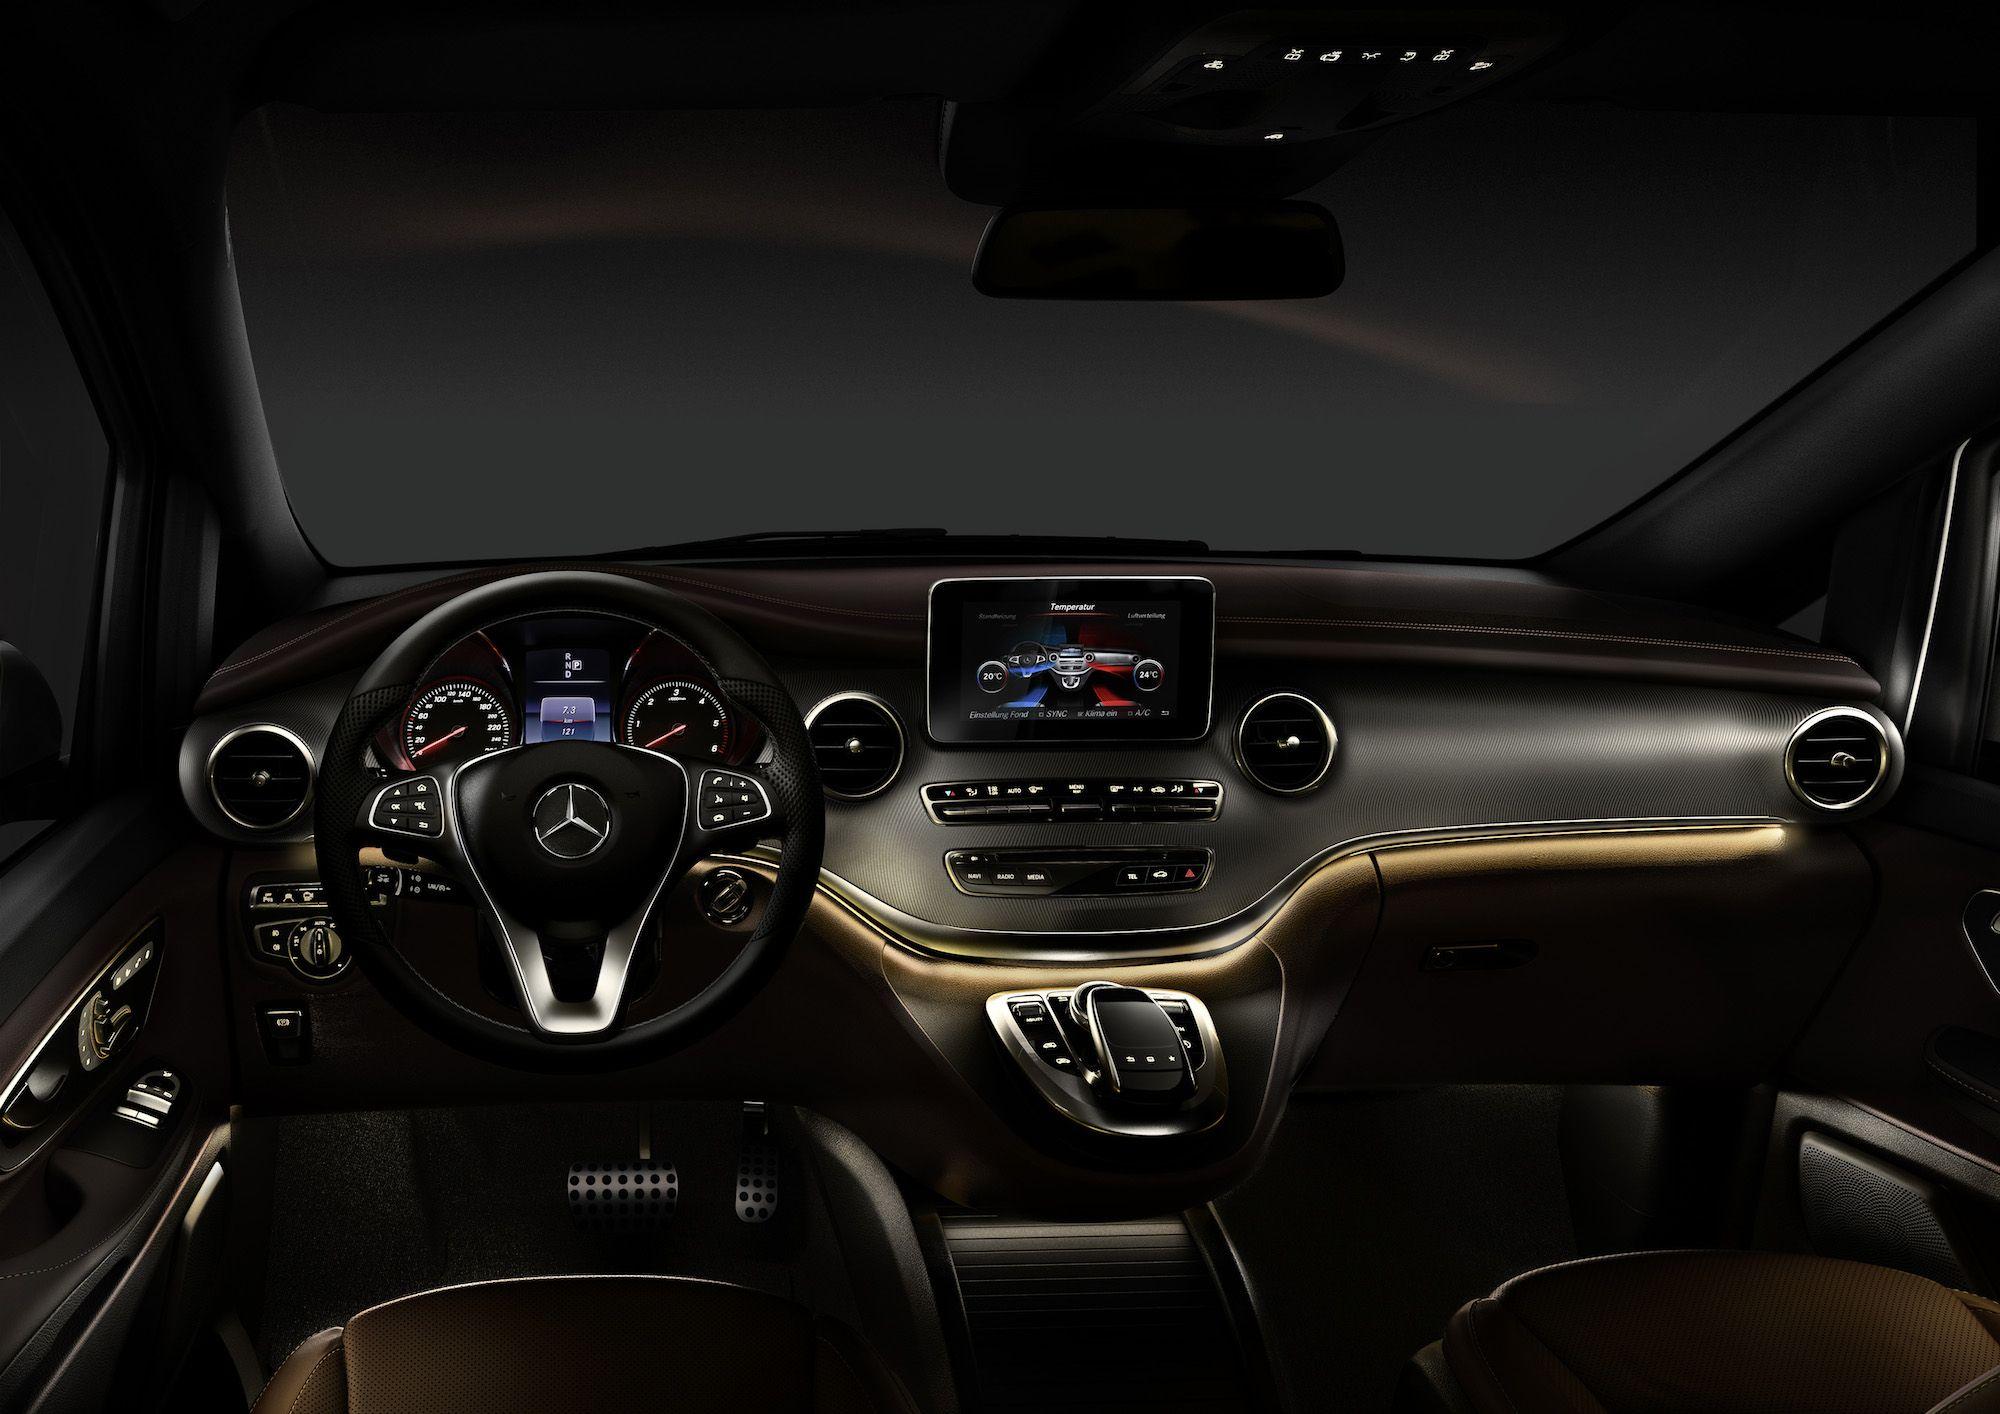 Mercedes benz new v class w447 interior revealed mbhess for Mercedes g interno